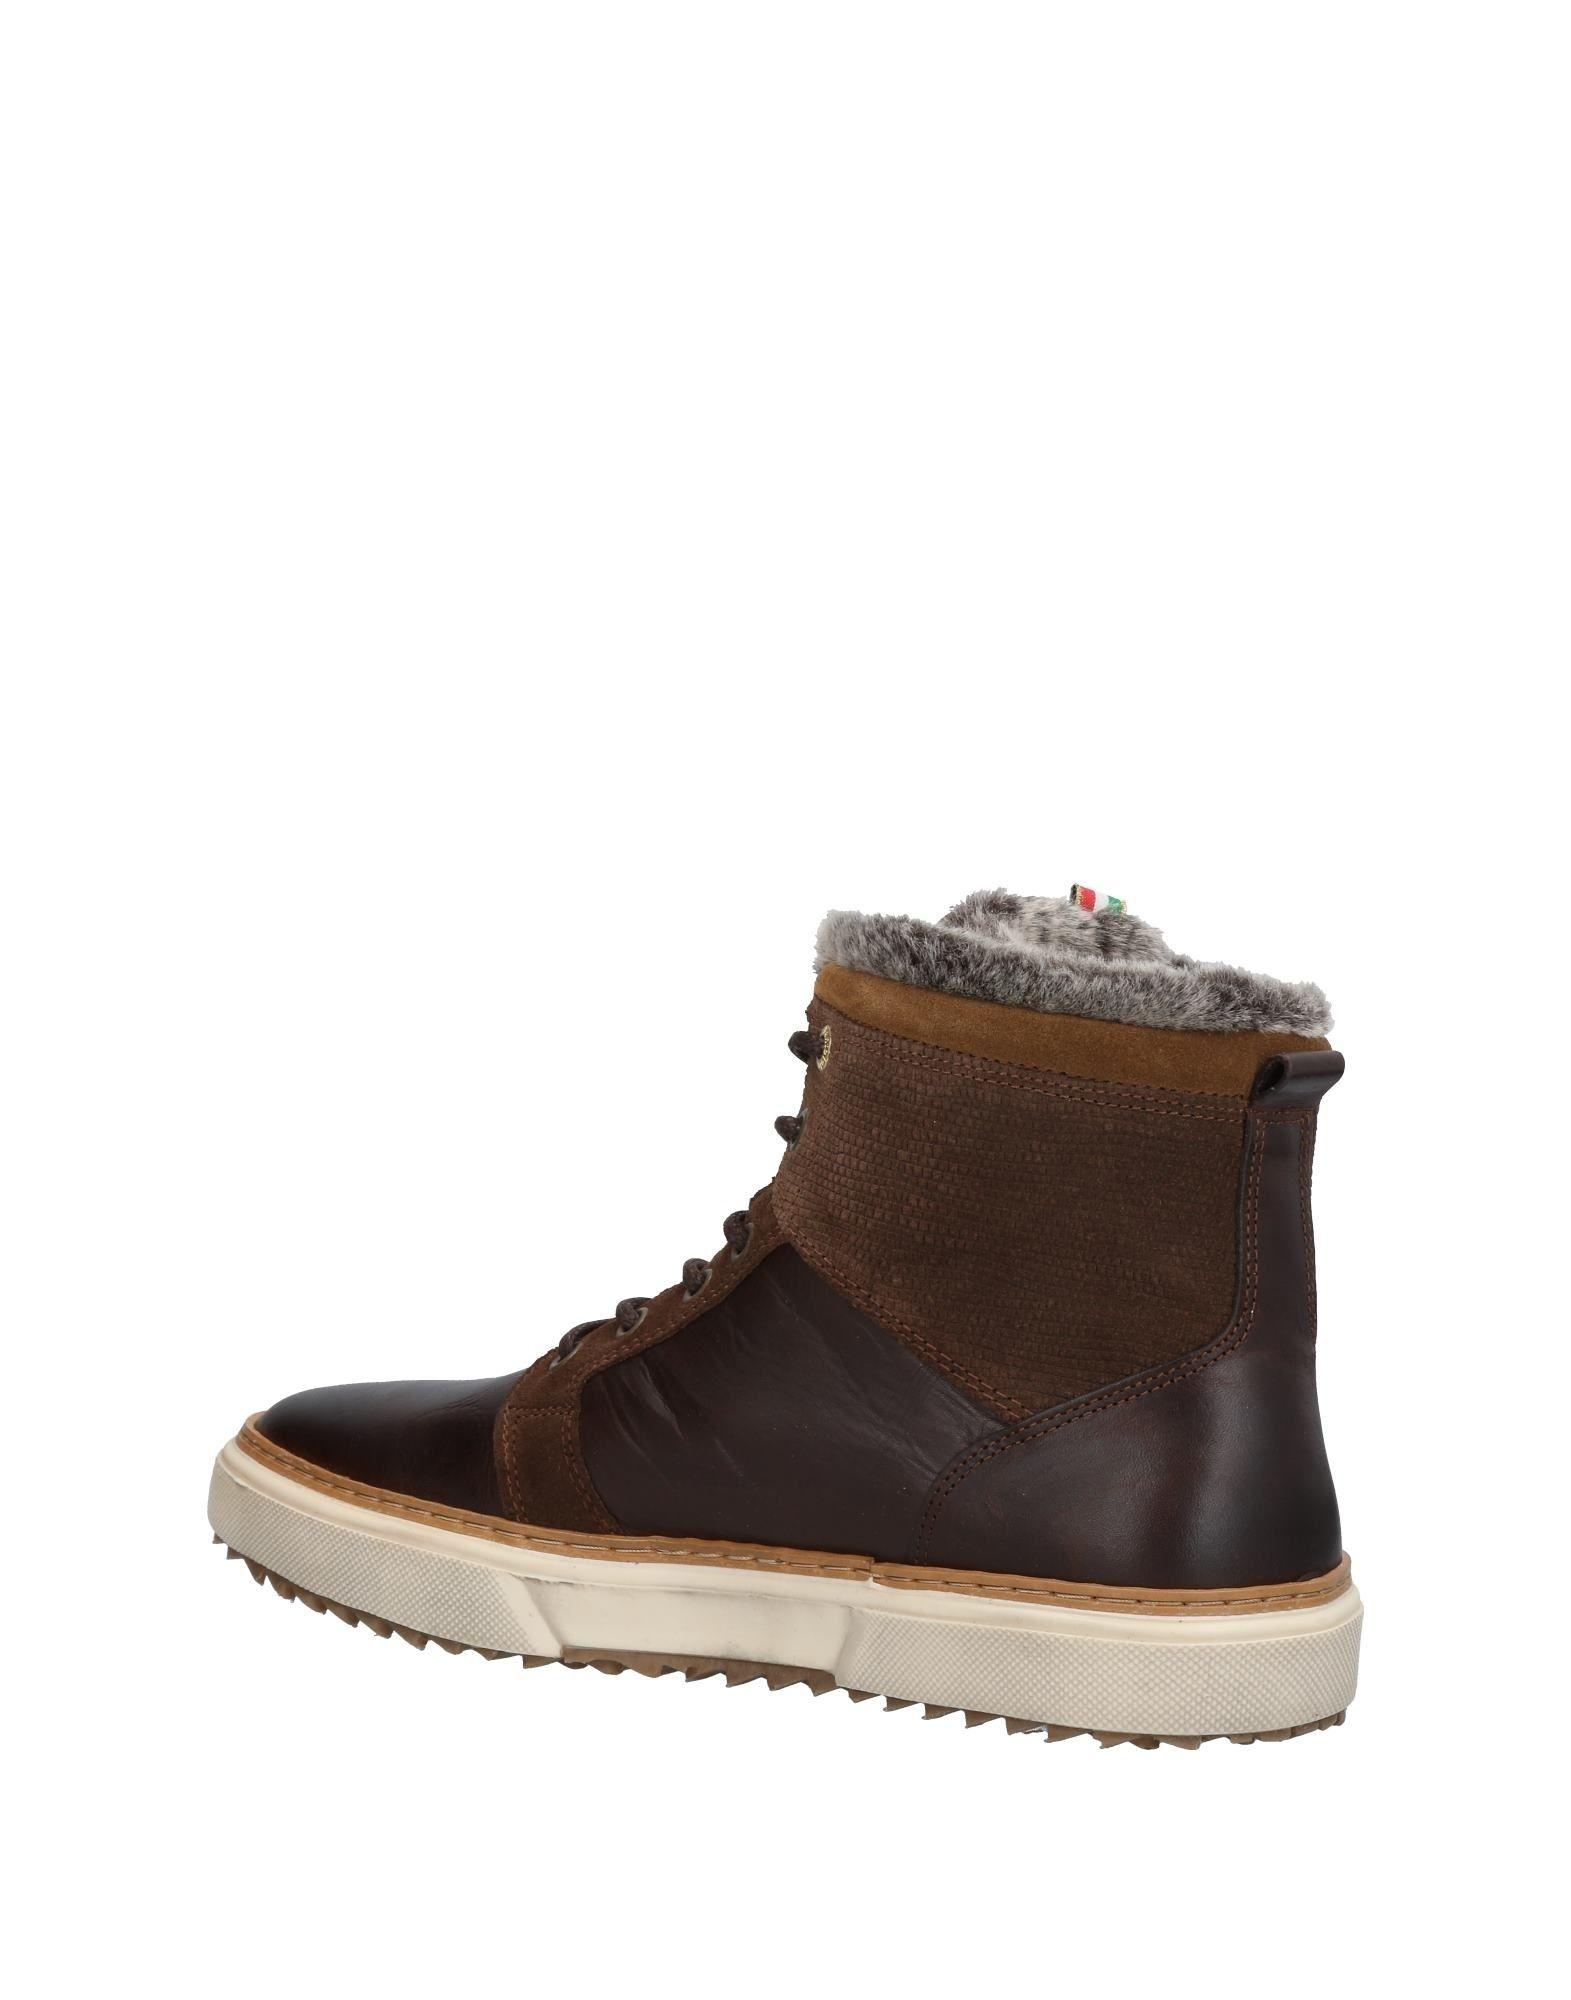 Rabatt echte Schuhe Pantofola D'oro 11455658CH Sneakers Herren  11455658CH D'oro caea26